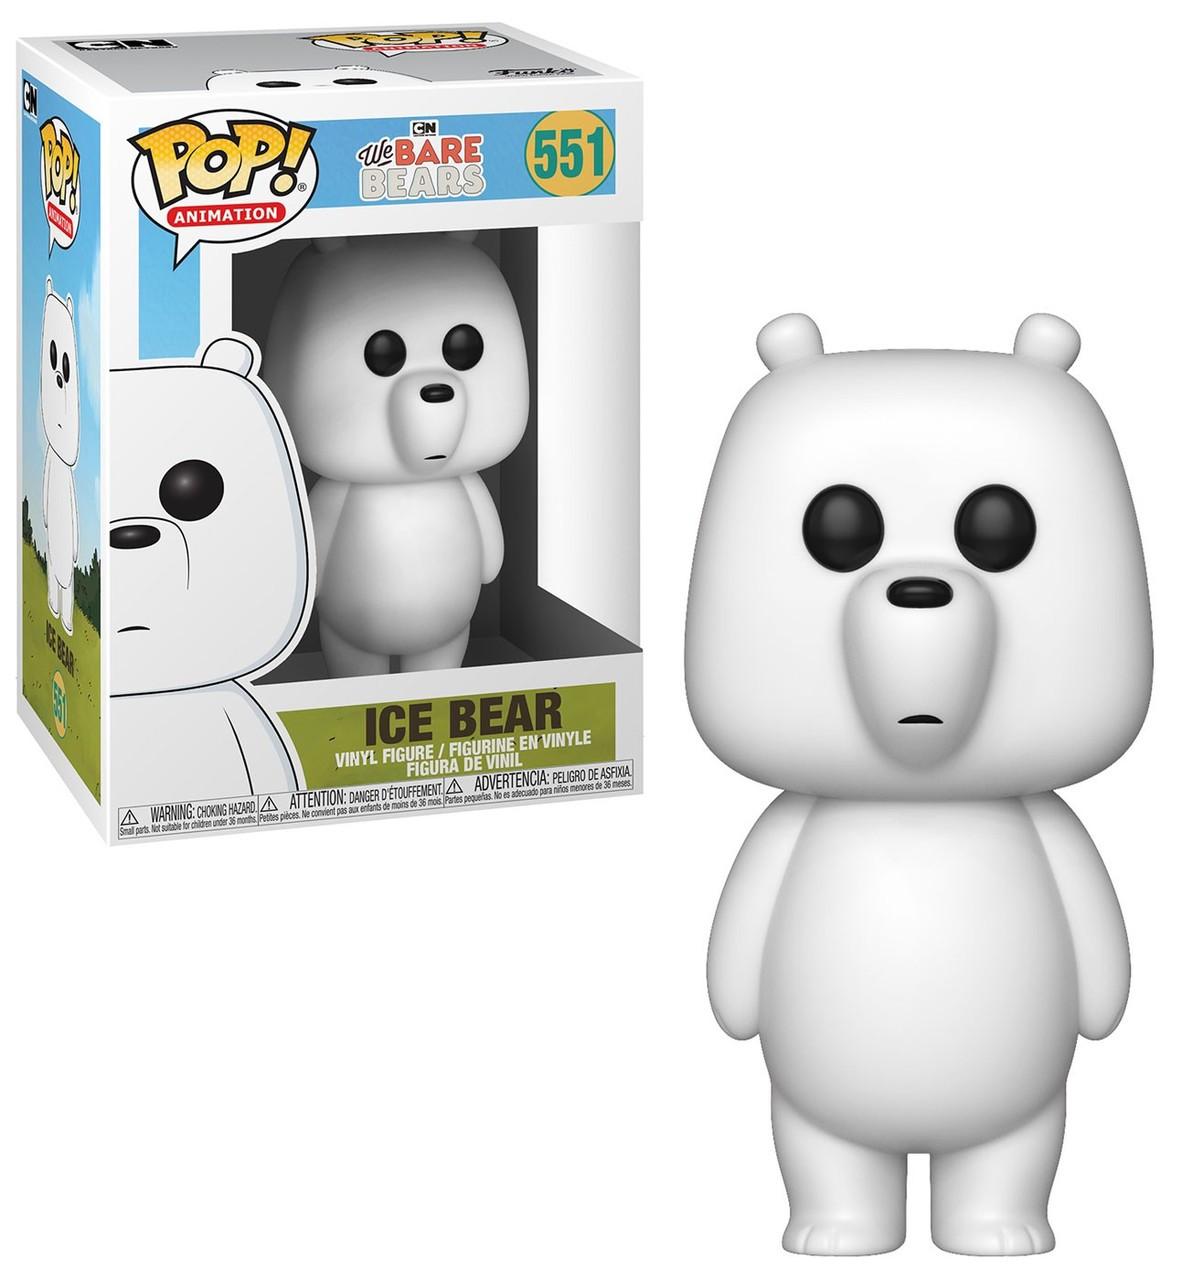 697a2b564a9f74 Funko We Bare Bears Funko POP Animation Ice Bear Vinyl Figure 551 - ToyWiz